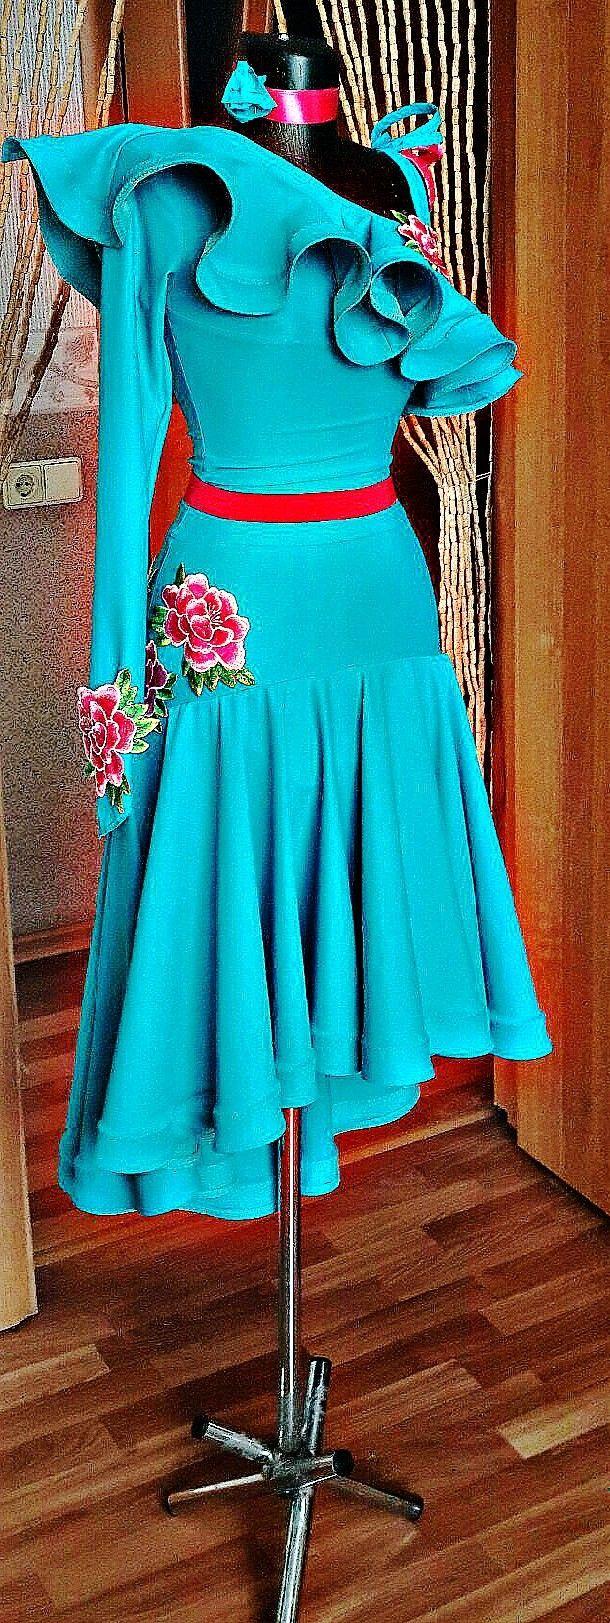 Pin By Marta On Latin America Latin Dance Dresses Dancesport Dresses Dance Dresses